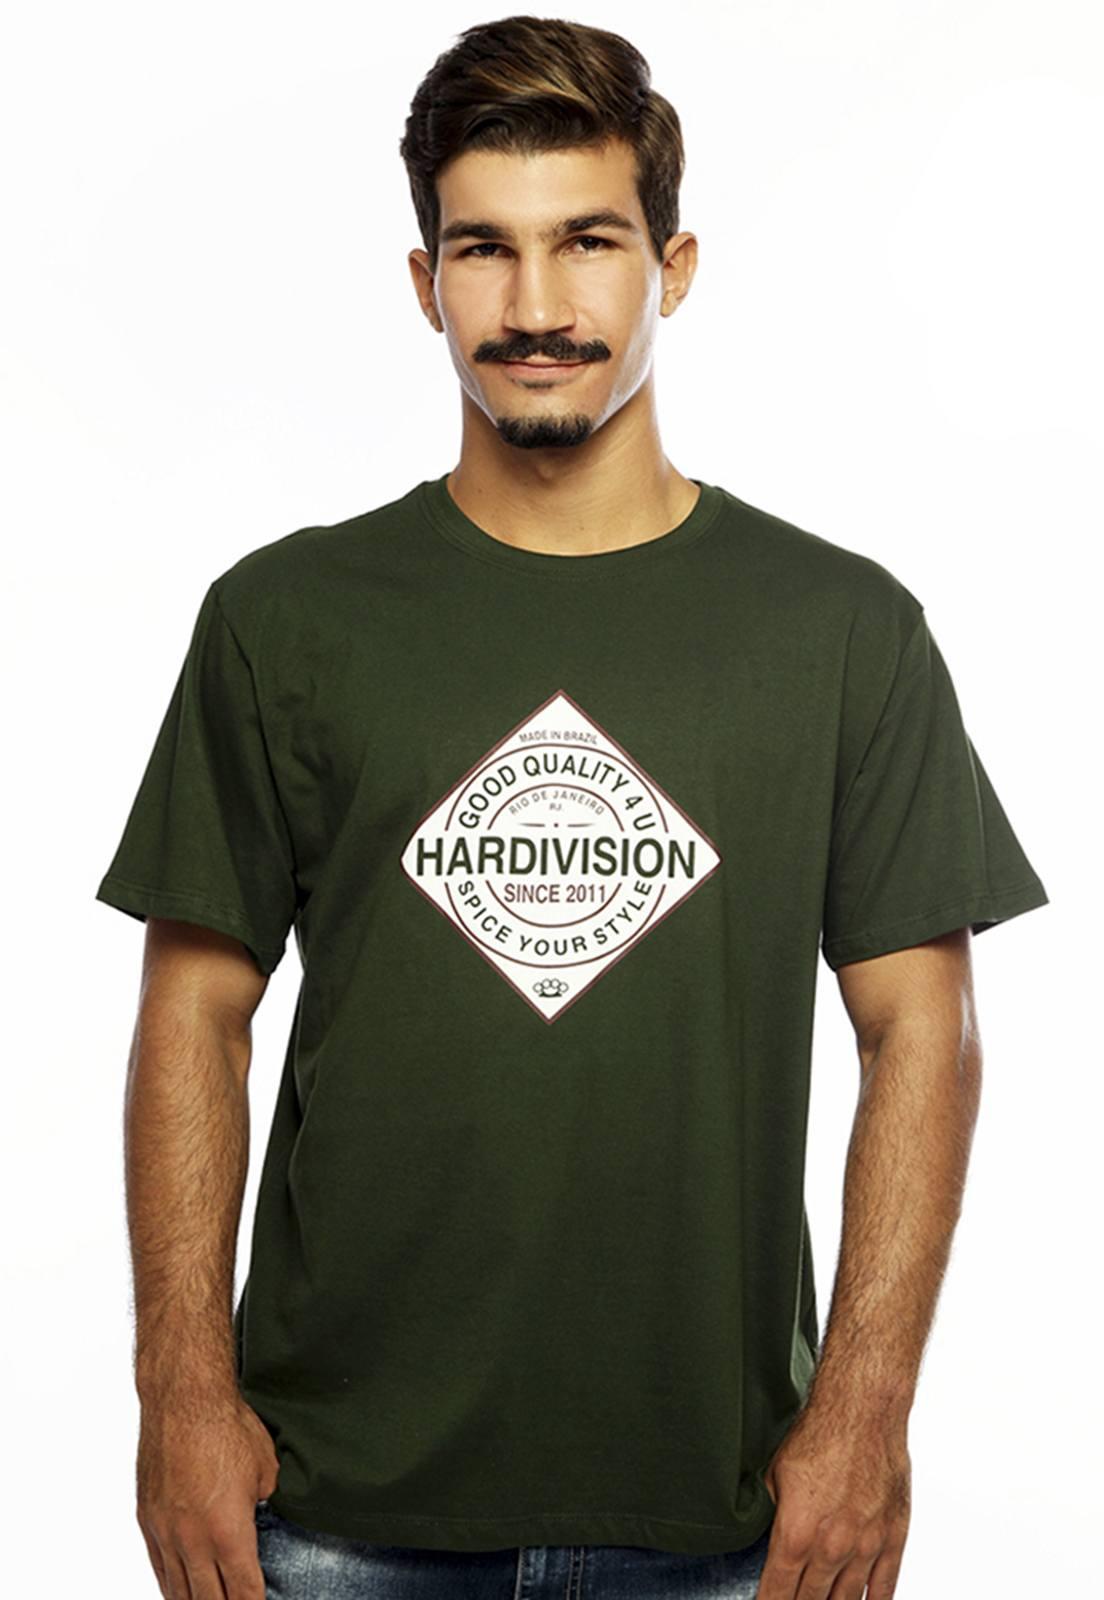 Camiseta masculina verde Spice - 100% algodão - Hardivision